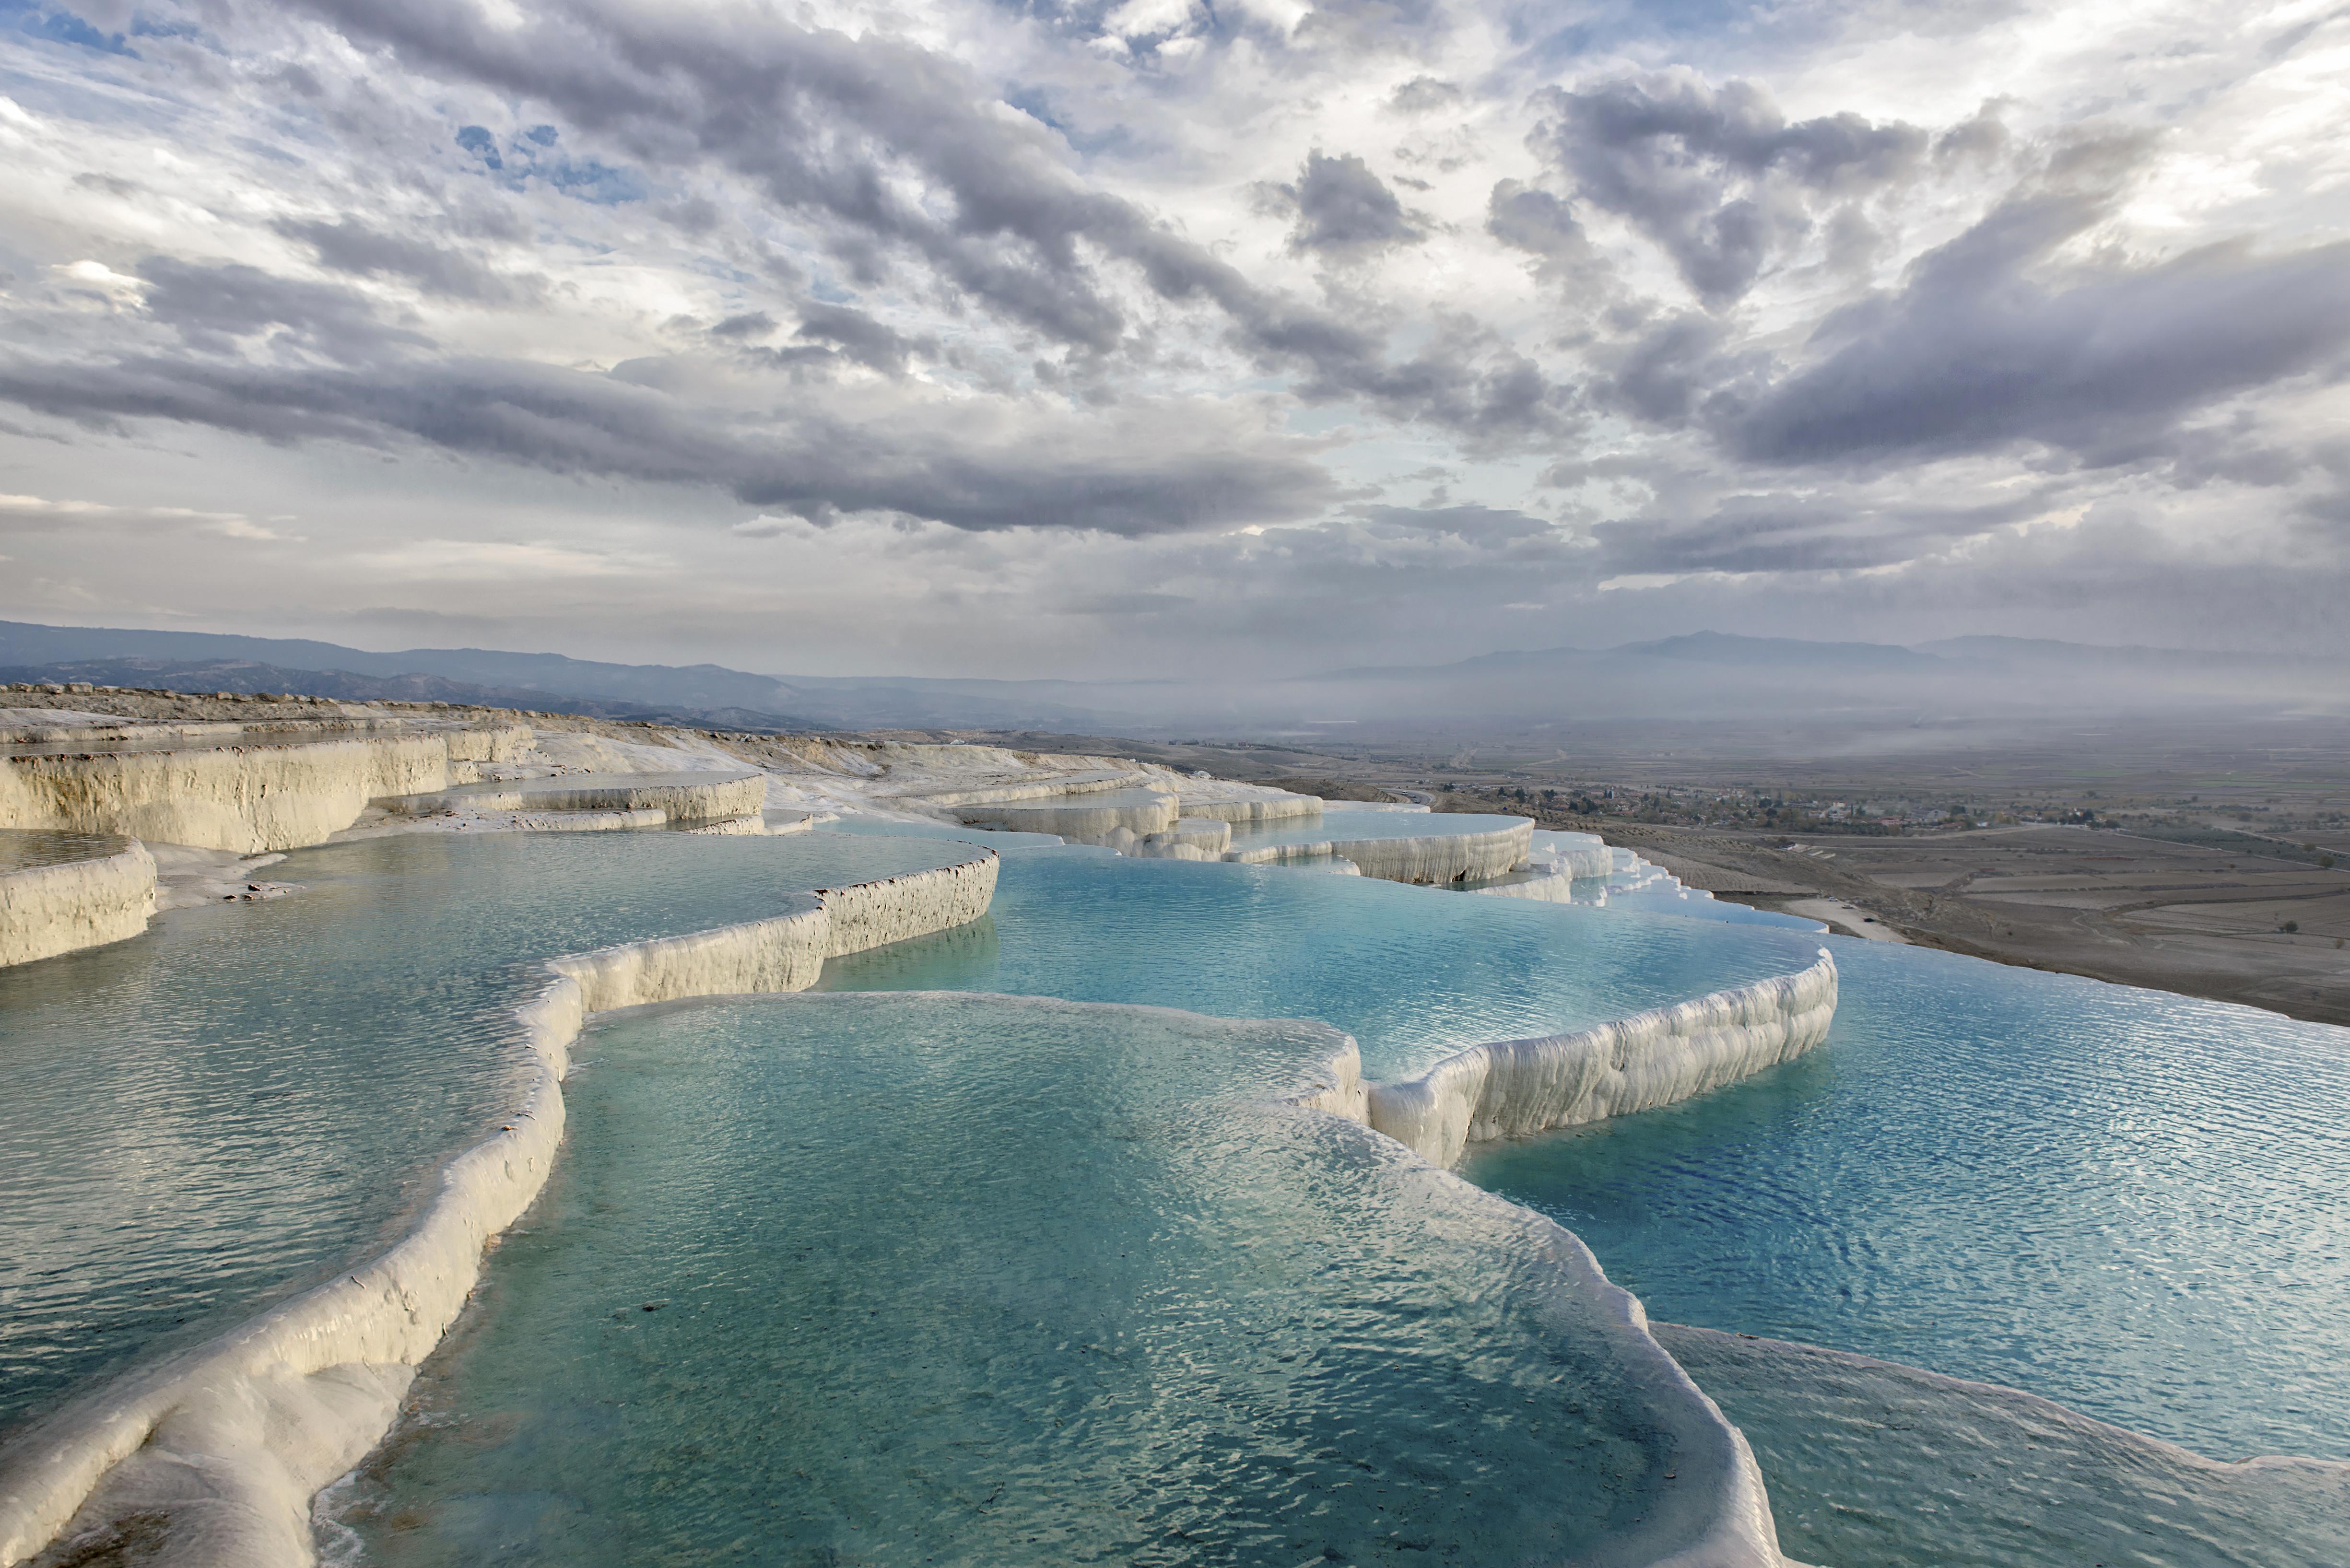 Objek Wisata Pamukkale, di Turki